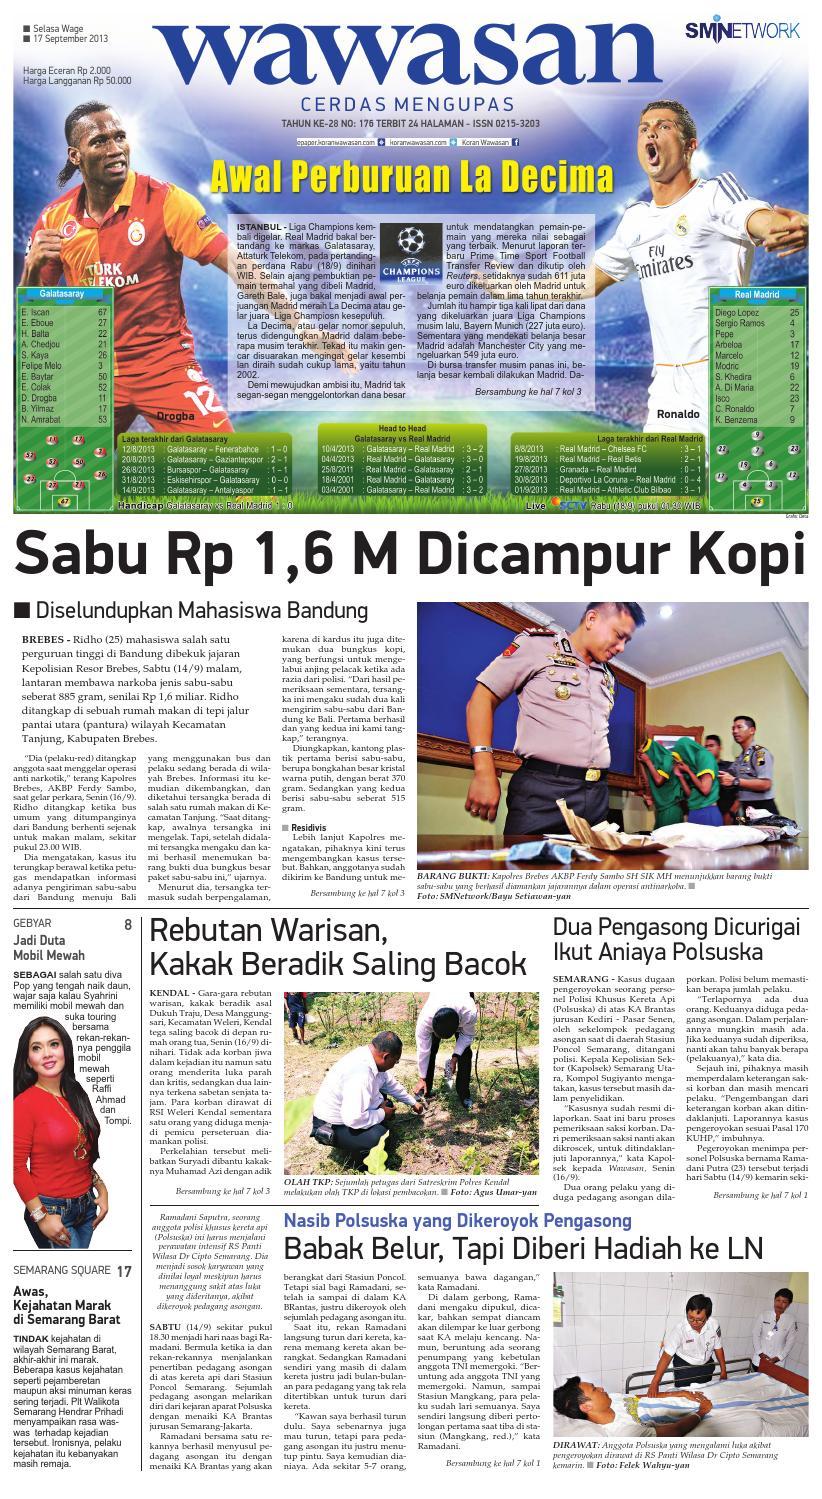 Jual Murah Giwang Emas Khas Bali By Salon Mega Update 2018 Tcash Vaganza 17 Botol Minum Olahraga Discovery 750ml Hitam Wawasan September 2013 Koran Pagi Issuu